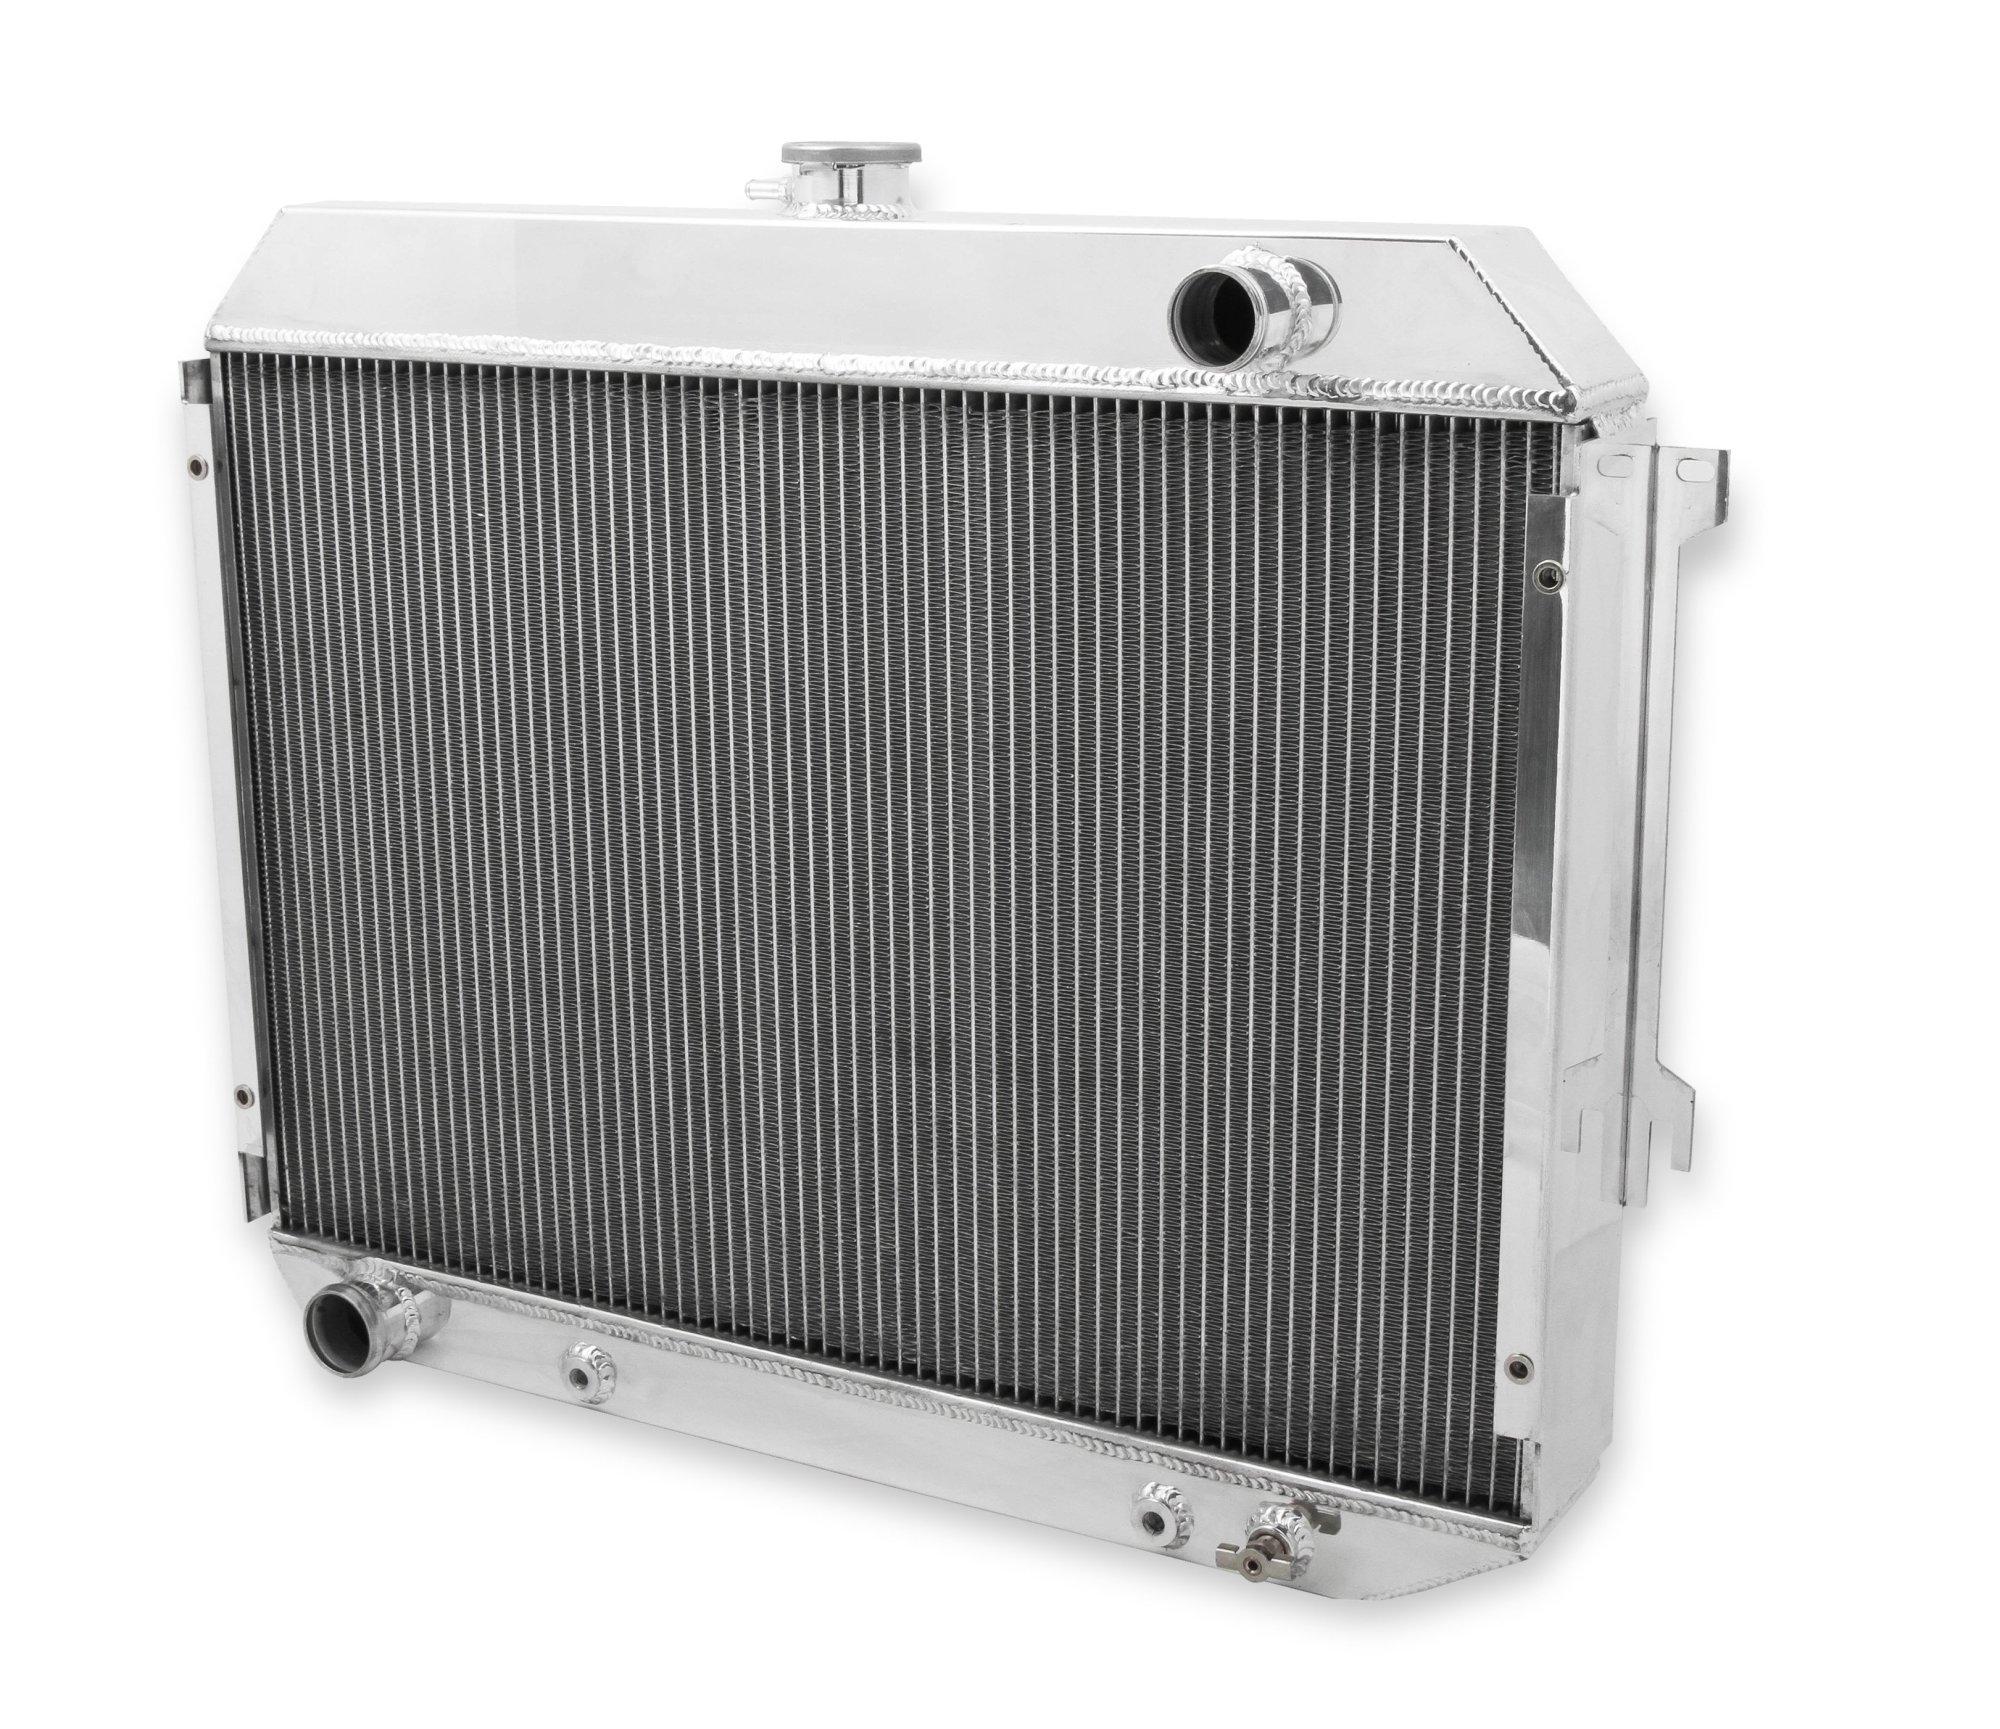 hight resolution of fb158 frostbite aluminum radiator 4 row image